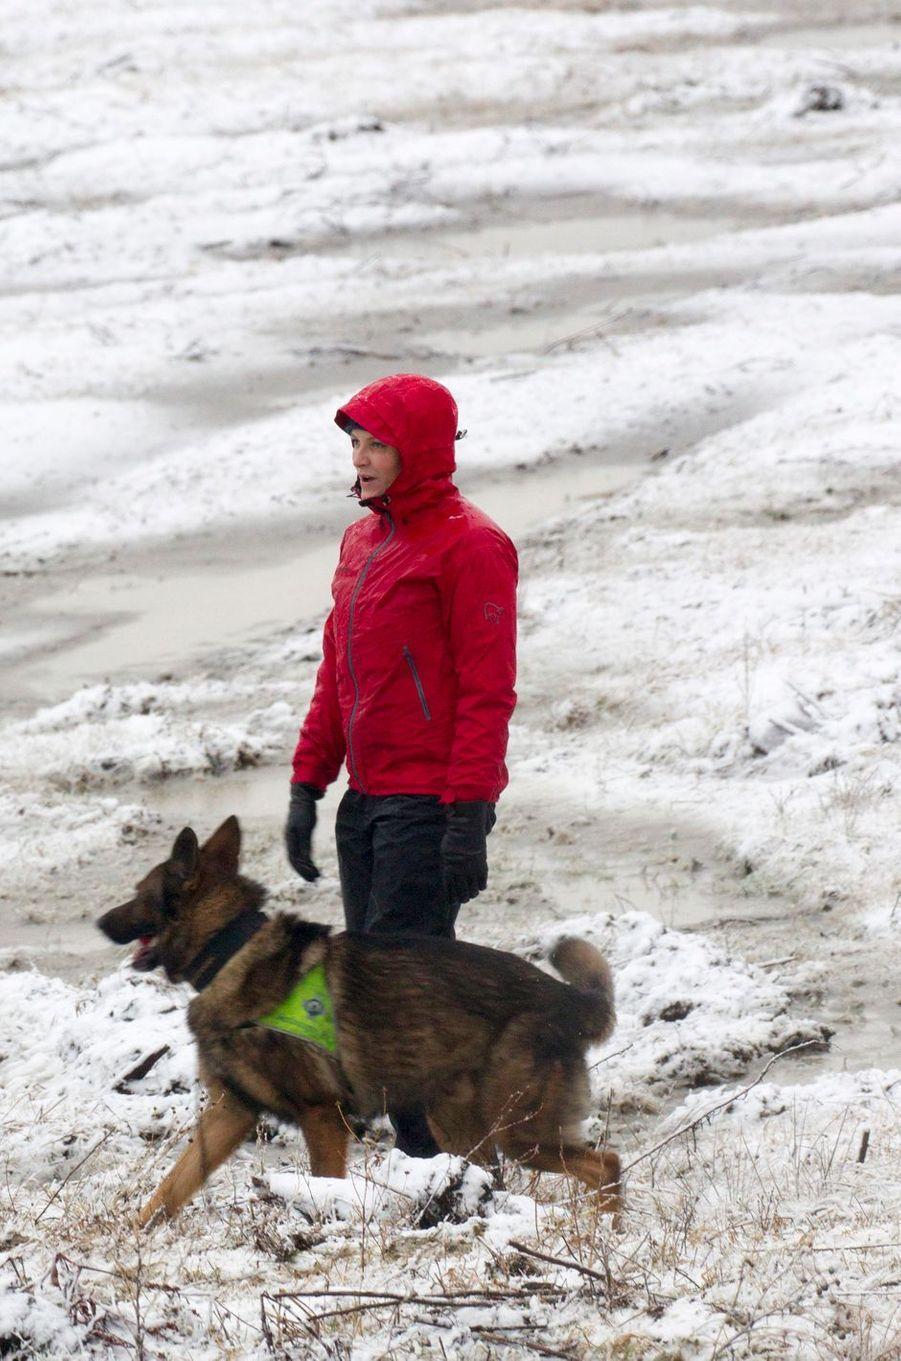 Mette Marit Haakon Norvege À Ski 11 Janv 2017 12